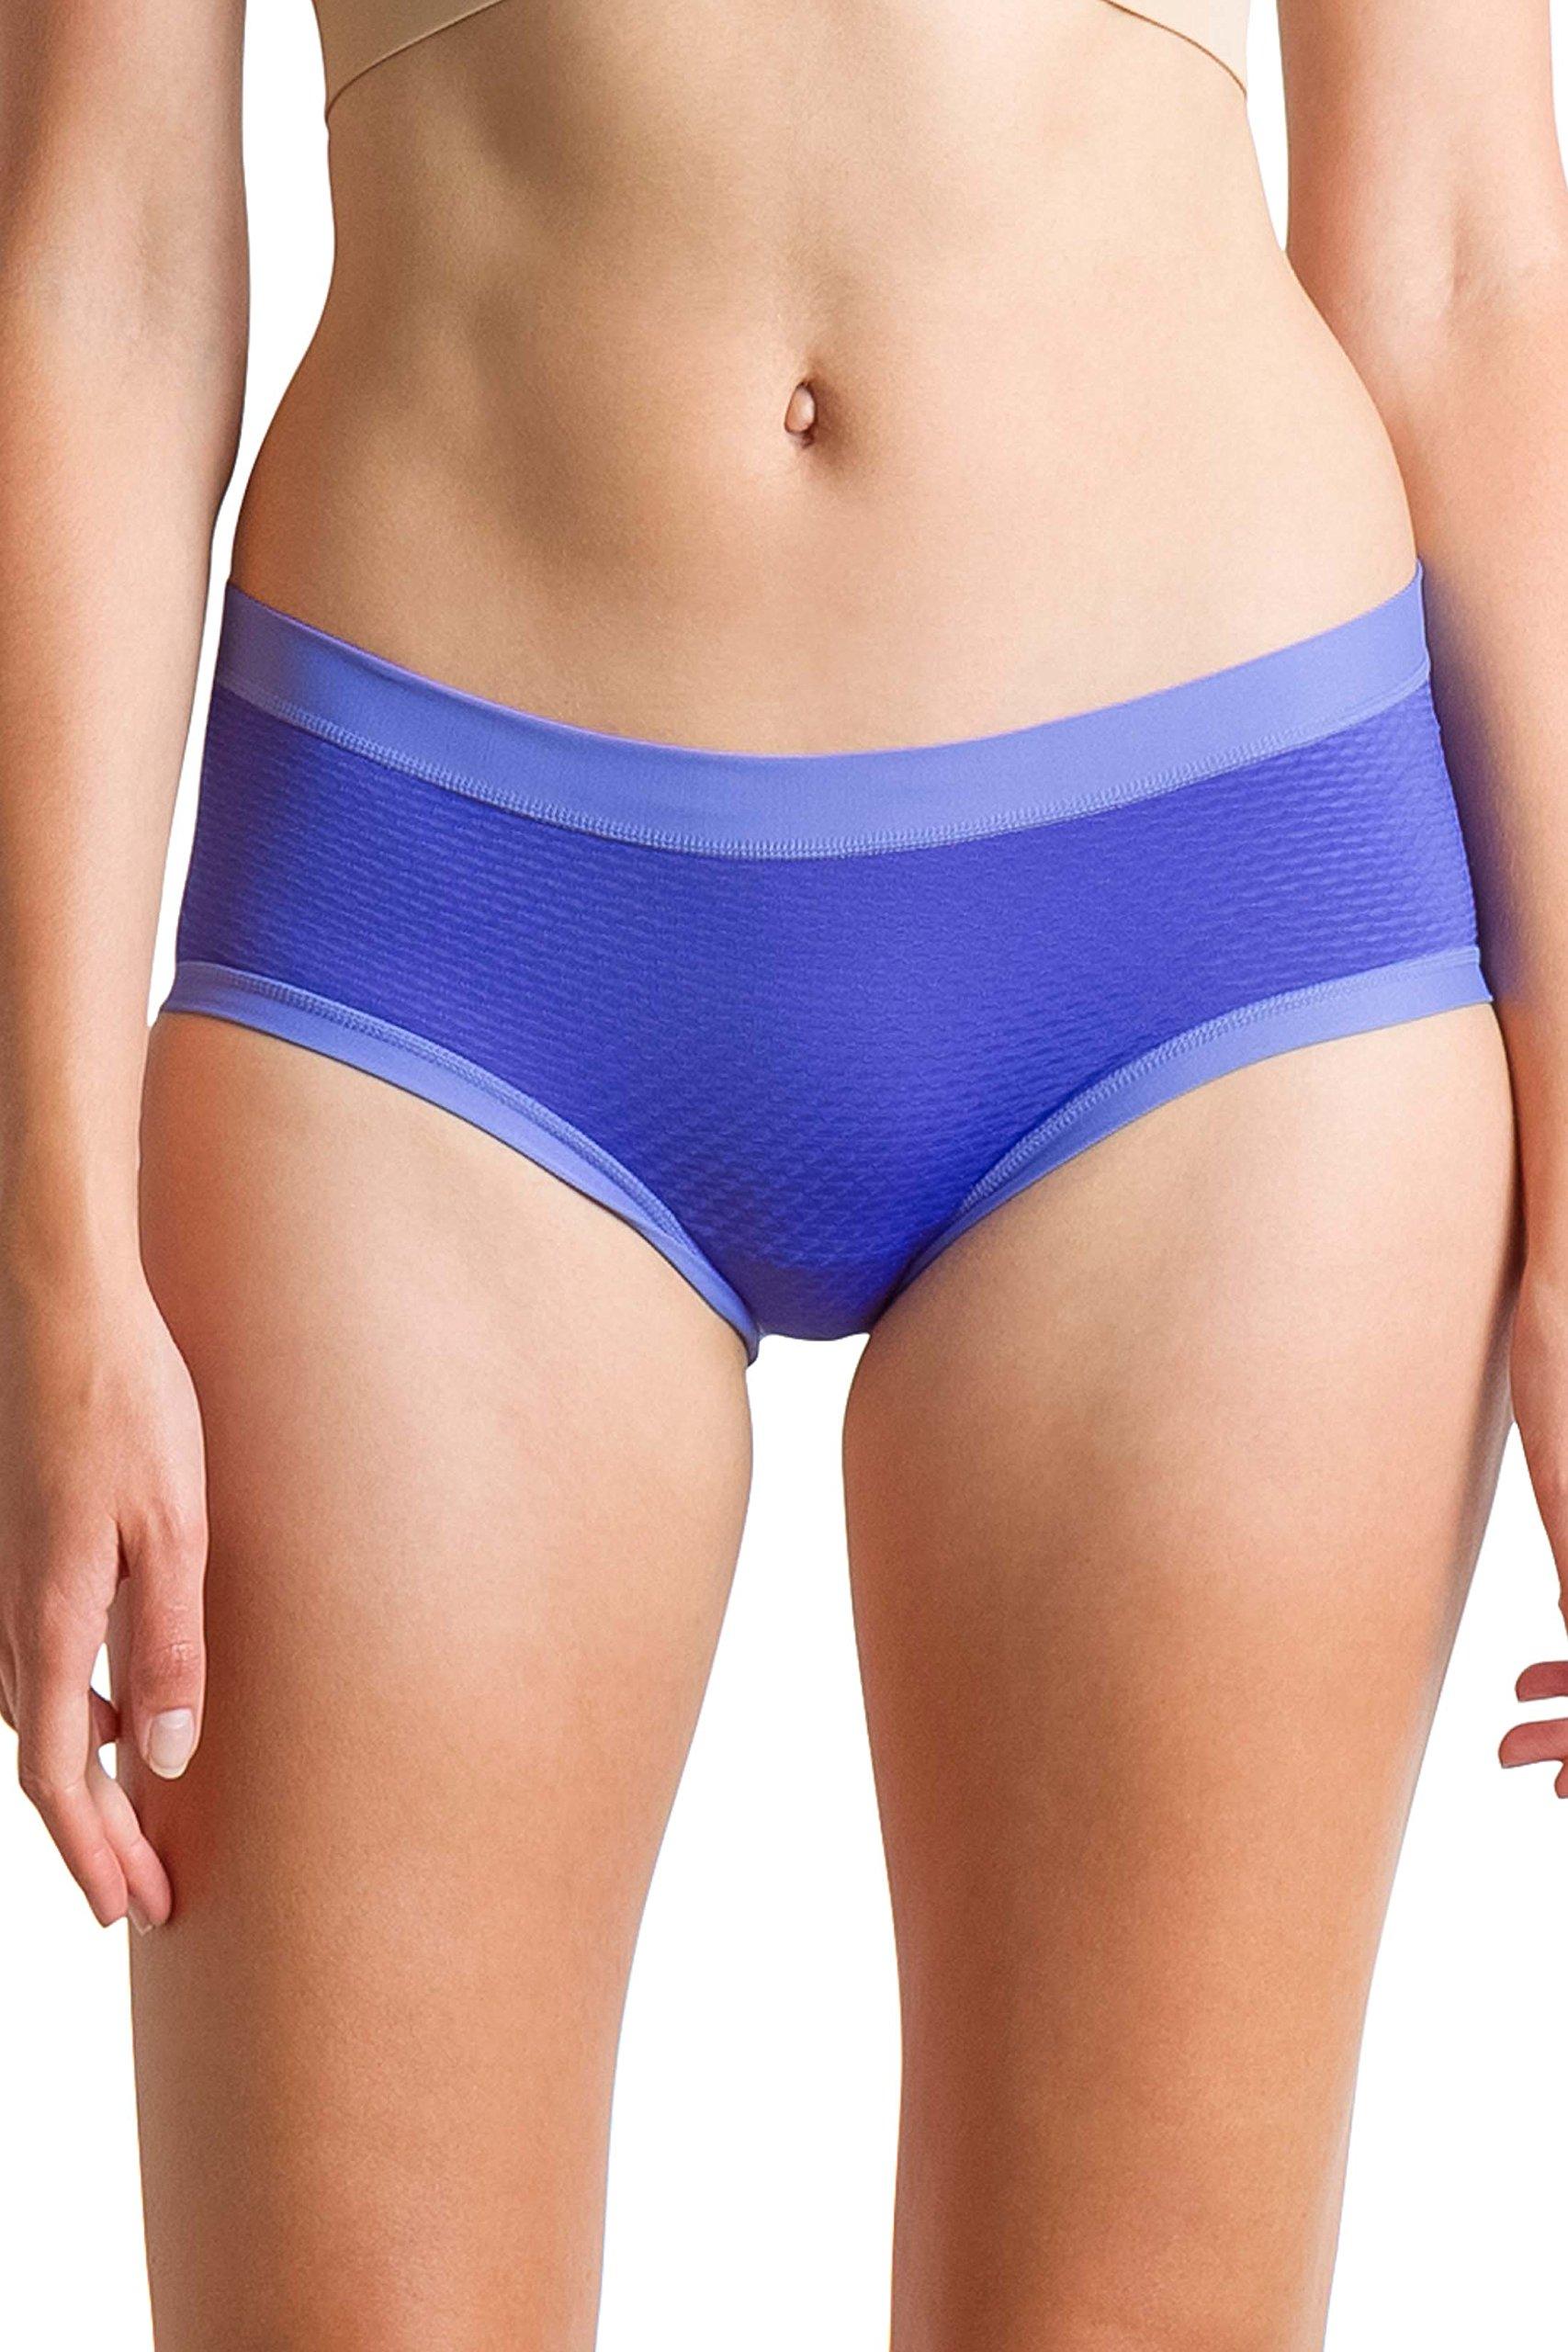 ExOfficio Women's Give-N-Go Sport Mesh Hipkini Underwear, Regal, Large